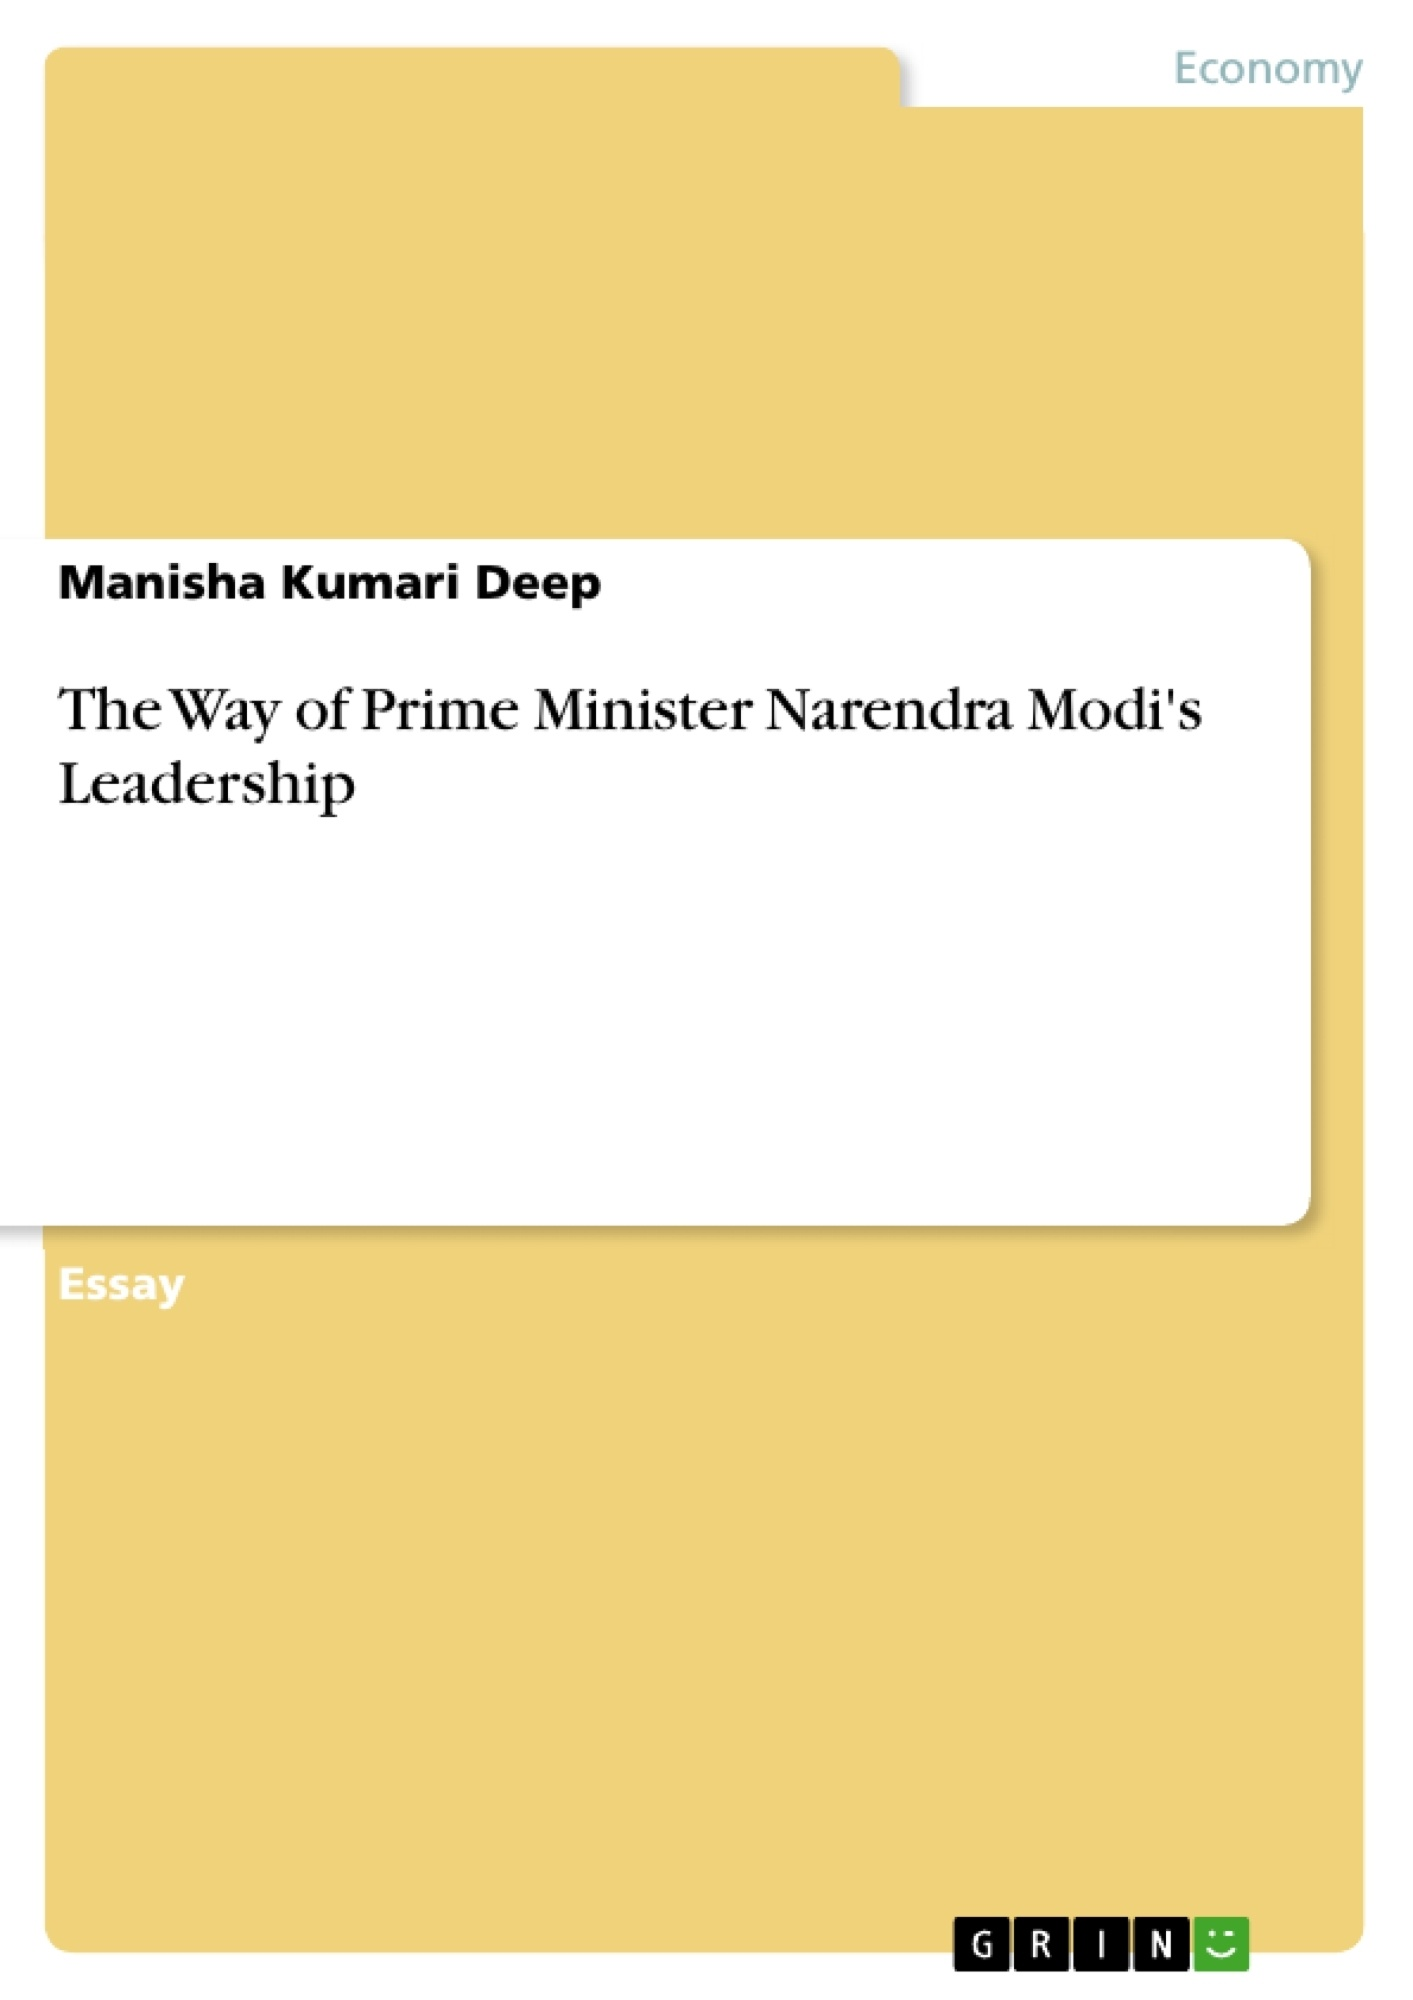 Title: The Way of Prime Minister Narendra Modi's Leadership